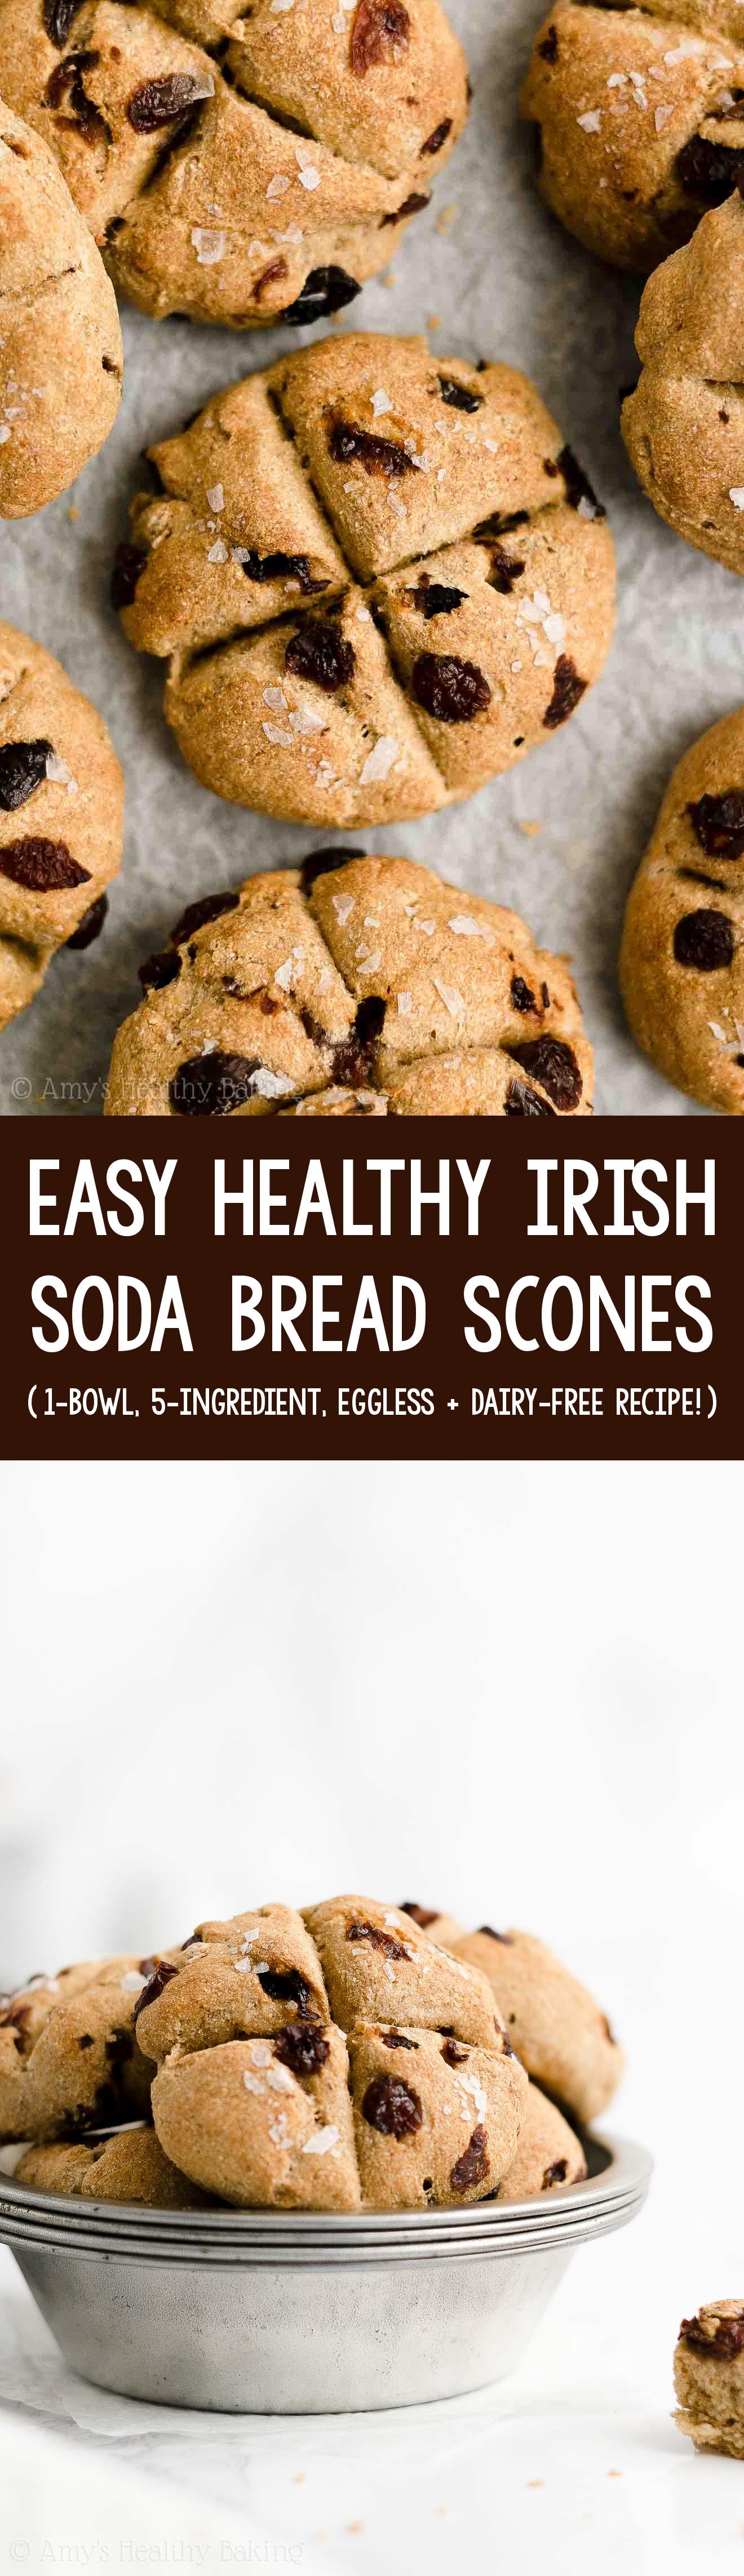 Easy Healthy Gluten Free Vegan Moist Raisin Irish Soda Bread Scones Without Buttermilk